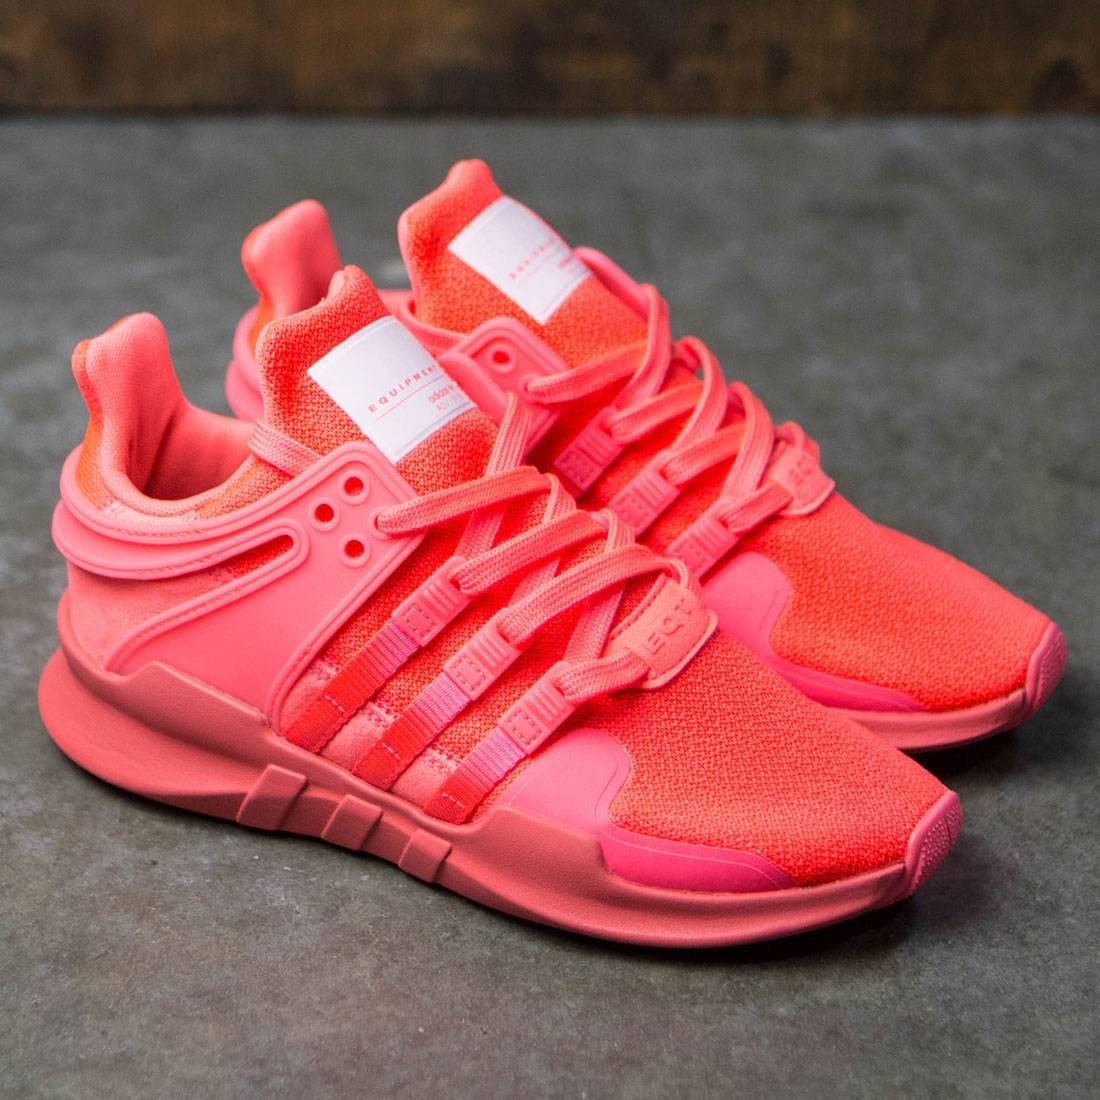 Женские кроссовки Adidas Women EQT Support ADV Red